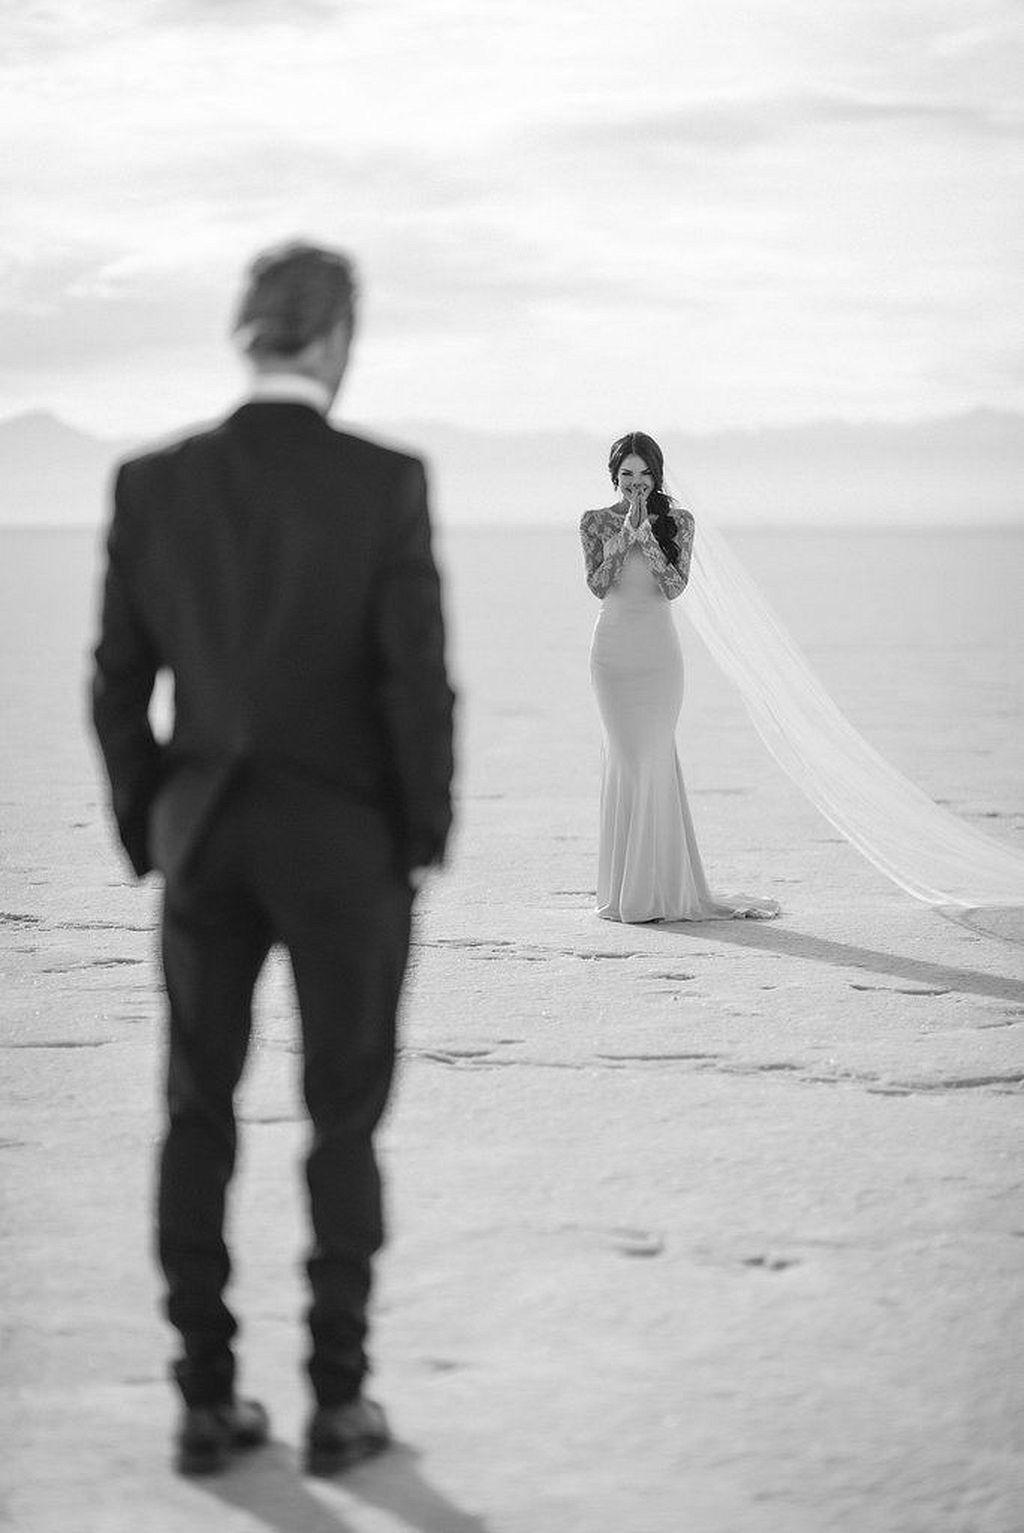 Beach wedding pre shoot  Pin by Sayda on Wedding photo  Pinterest  Photography Weddings